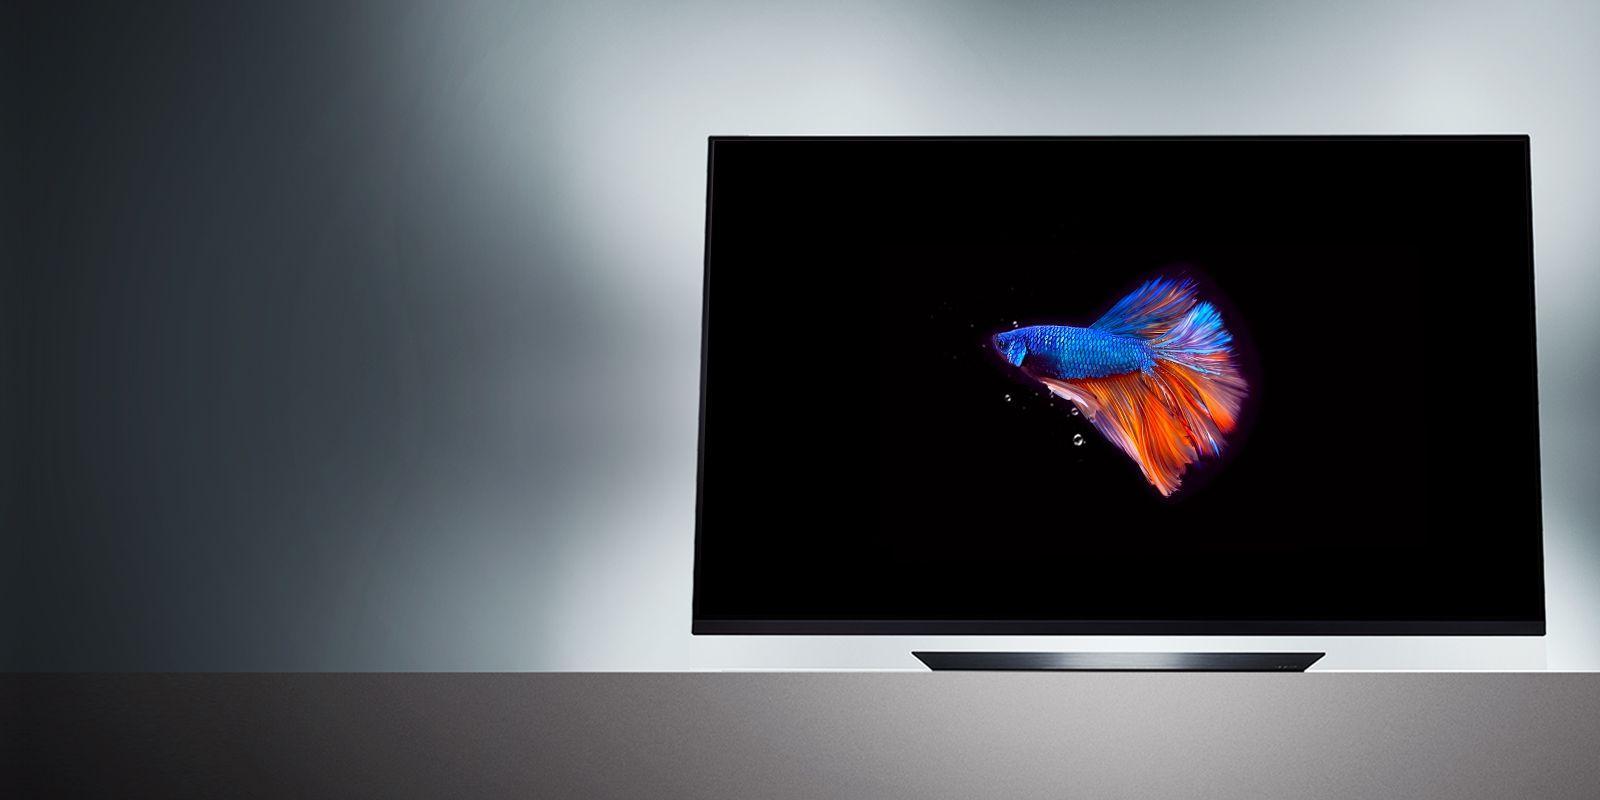 TV 4K Wallpapers - Top Free TV 4K